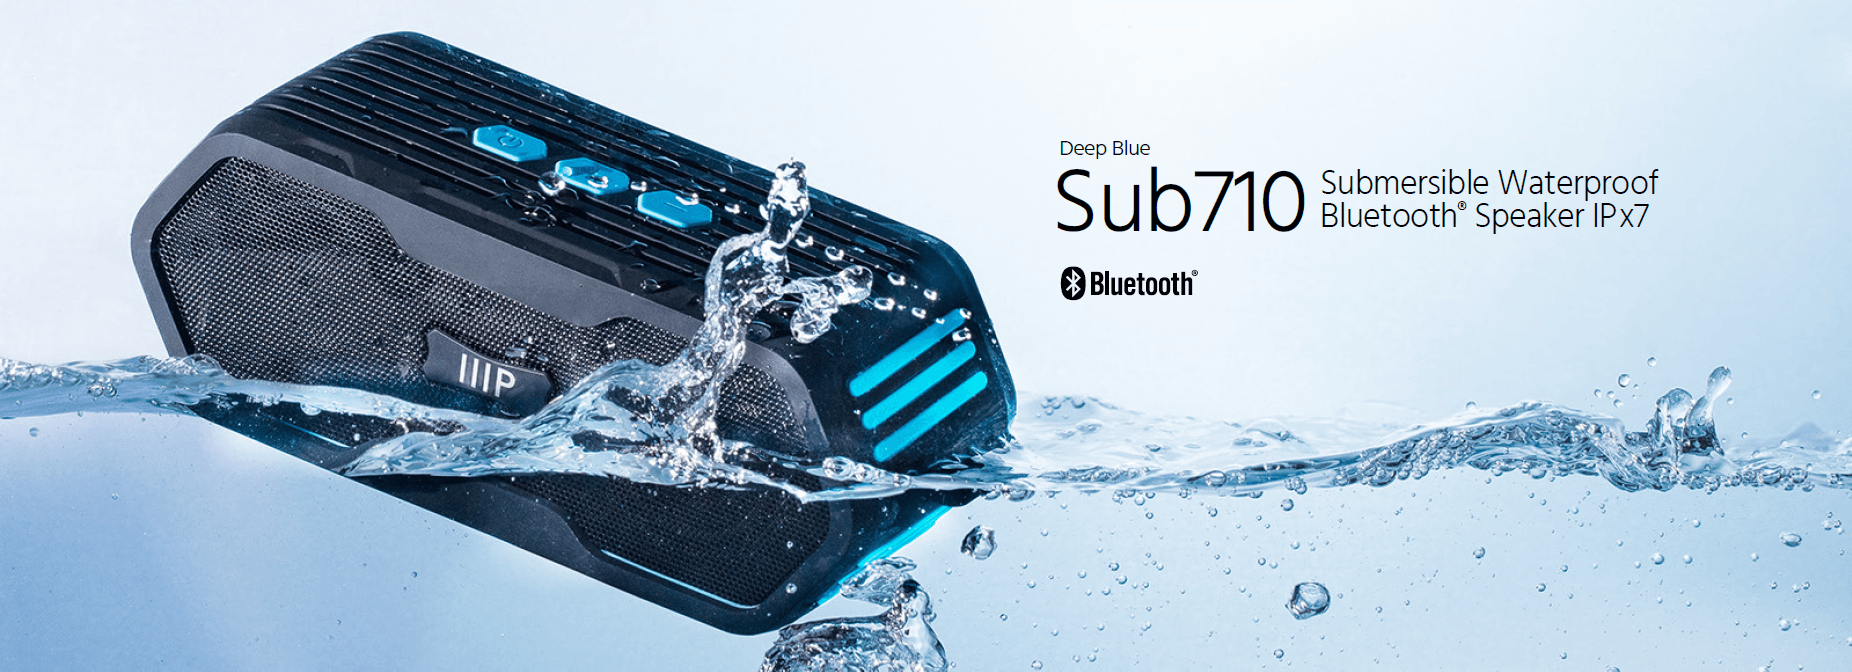 Sub 710